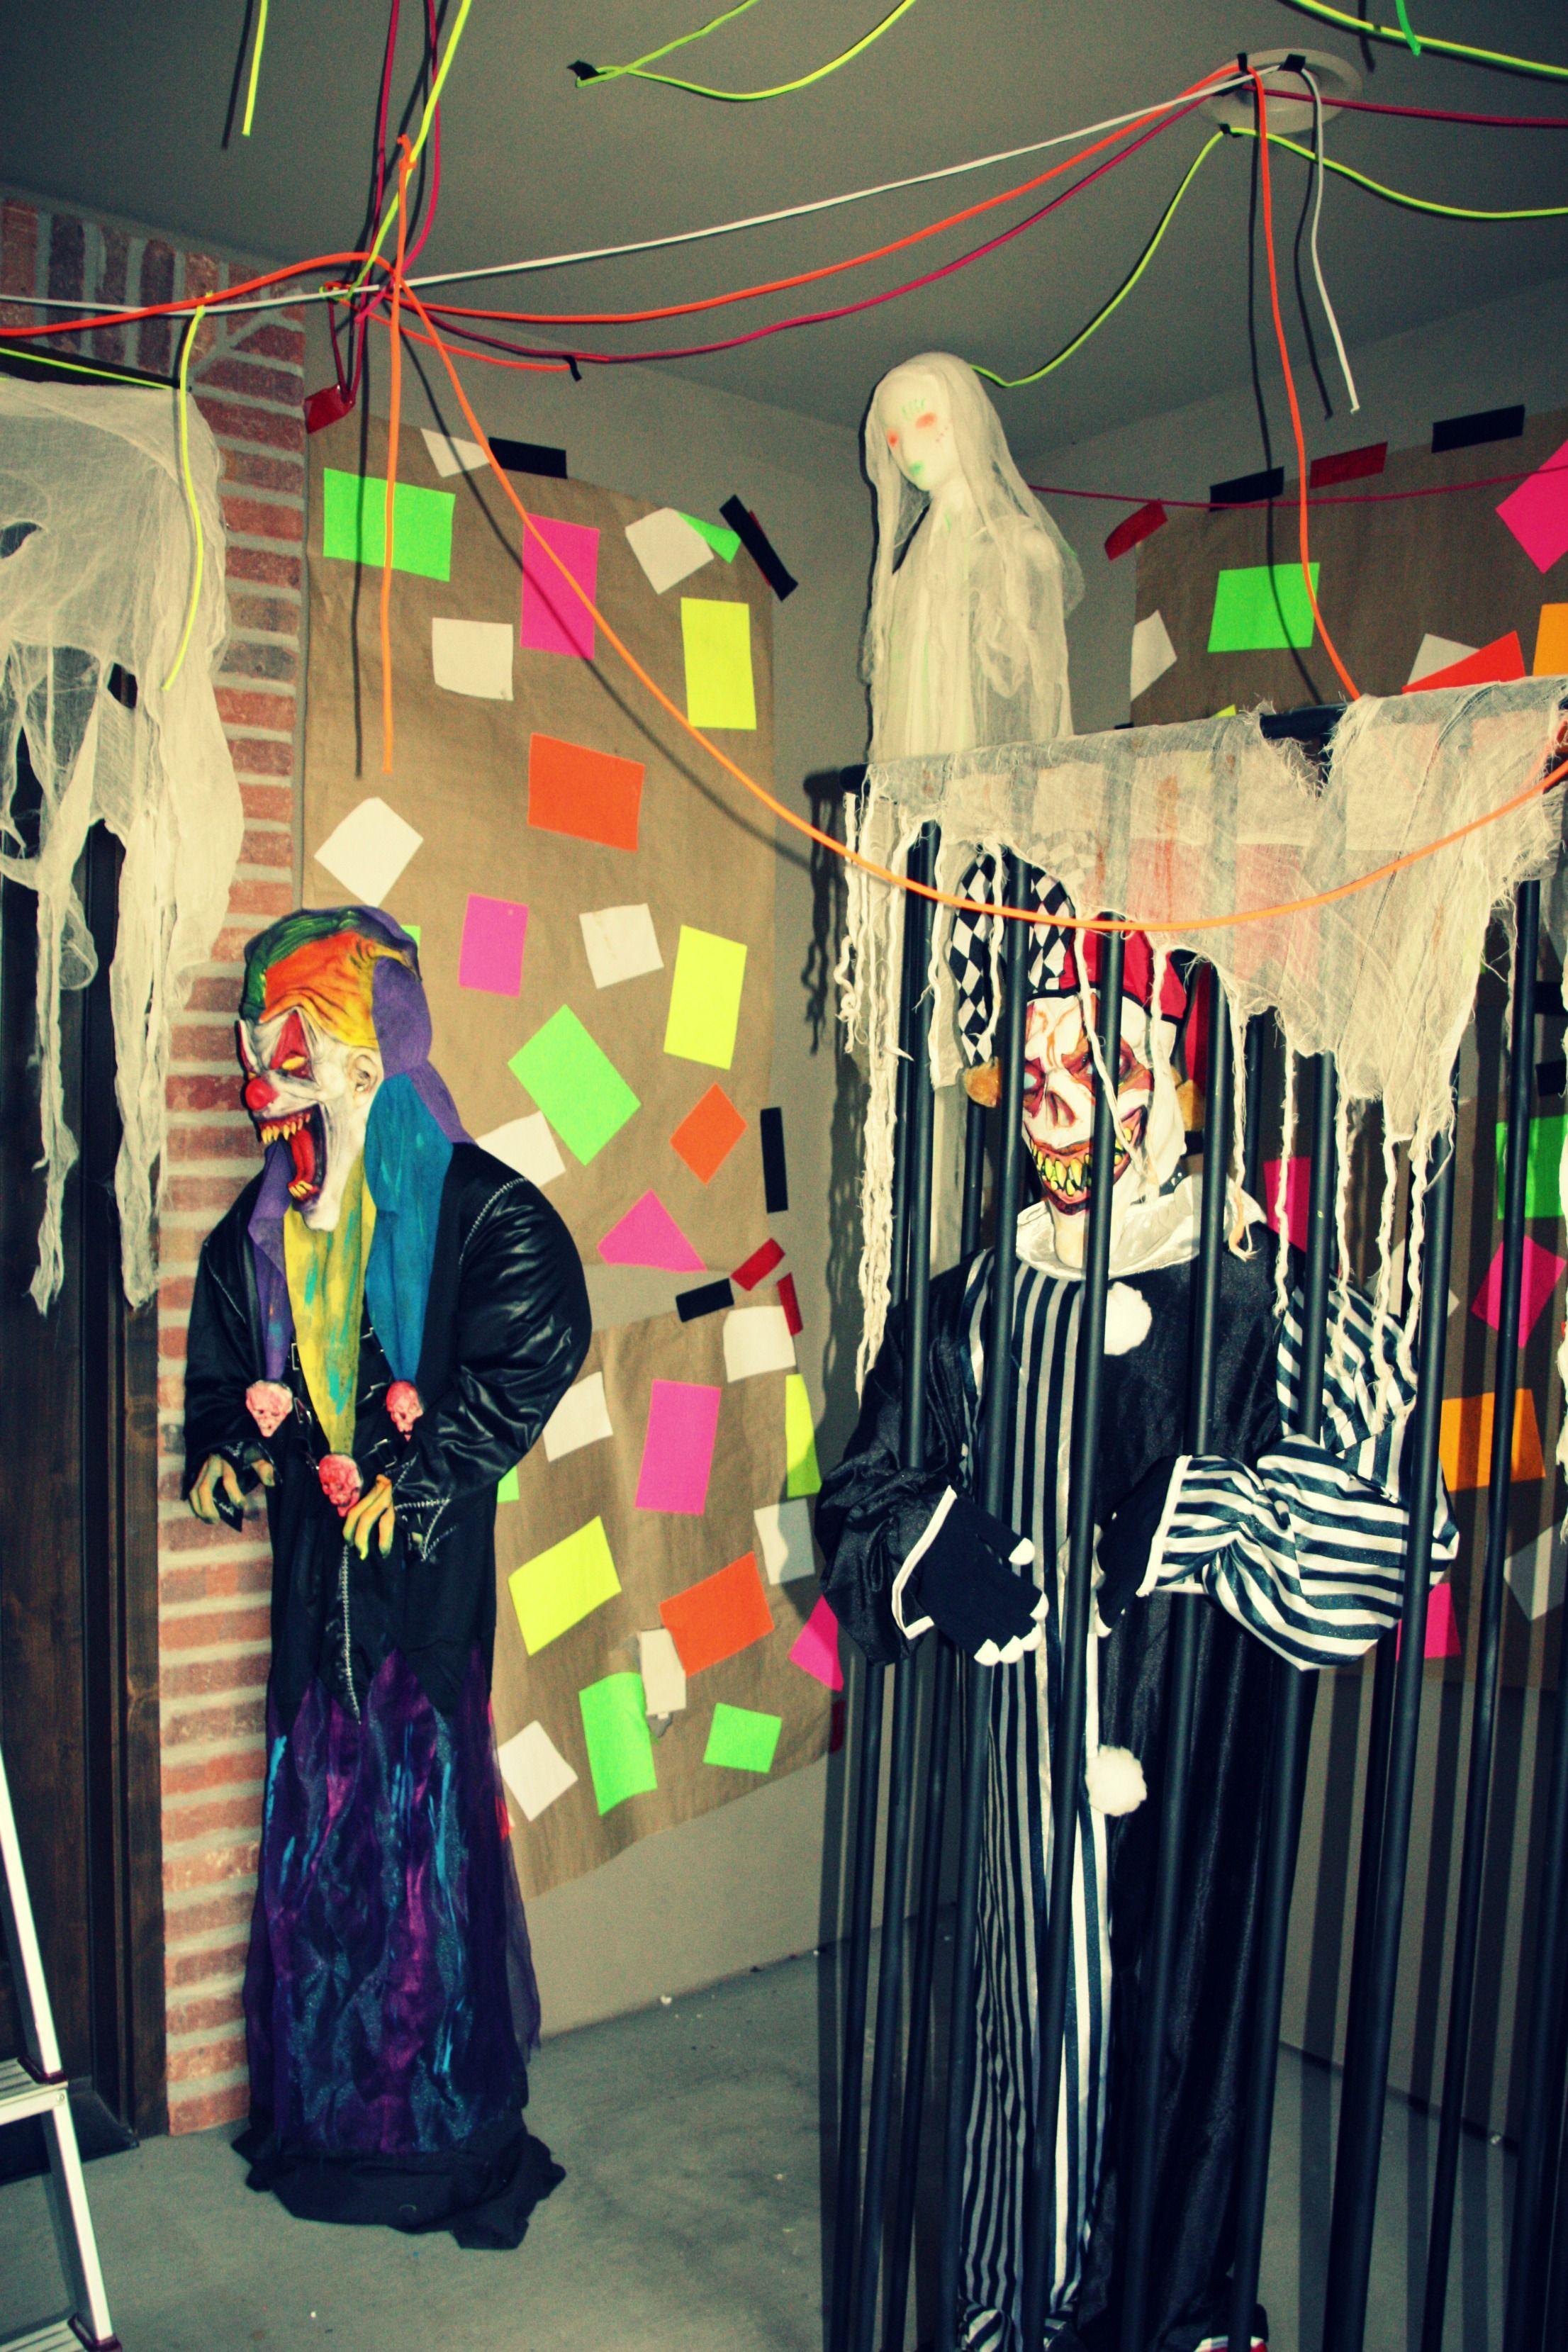 Clowns Black Light Use White Neon Colors Halloween Circus Creepy Carnival Halloween Props